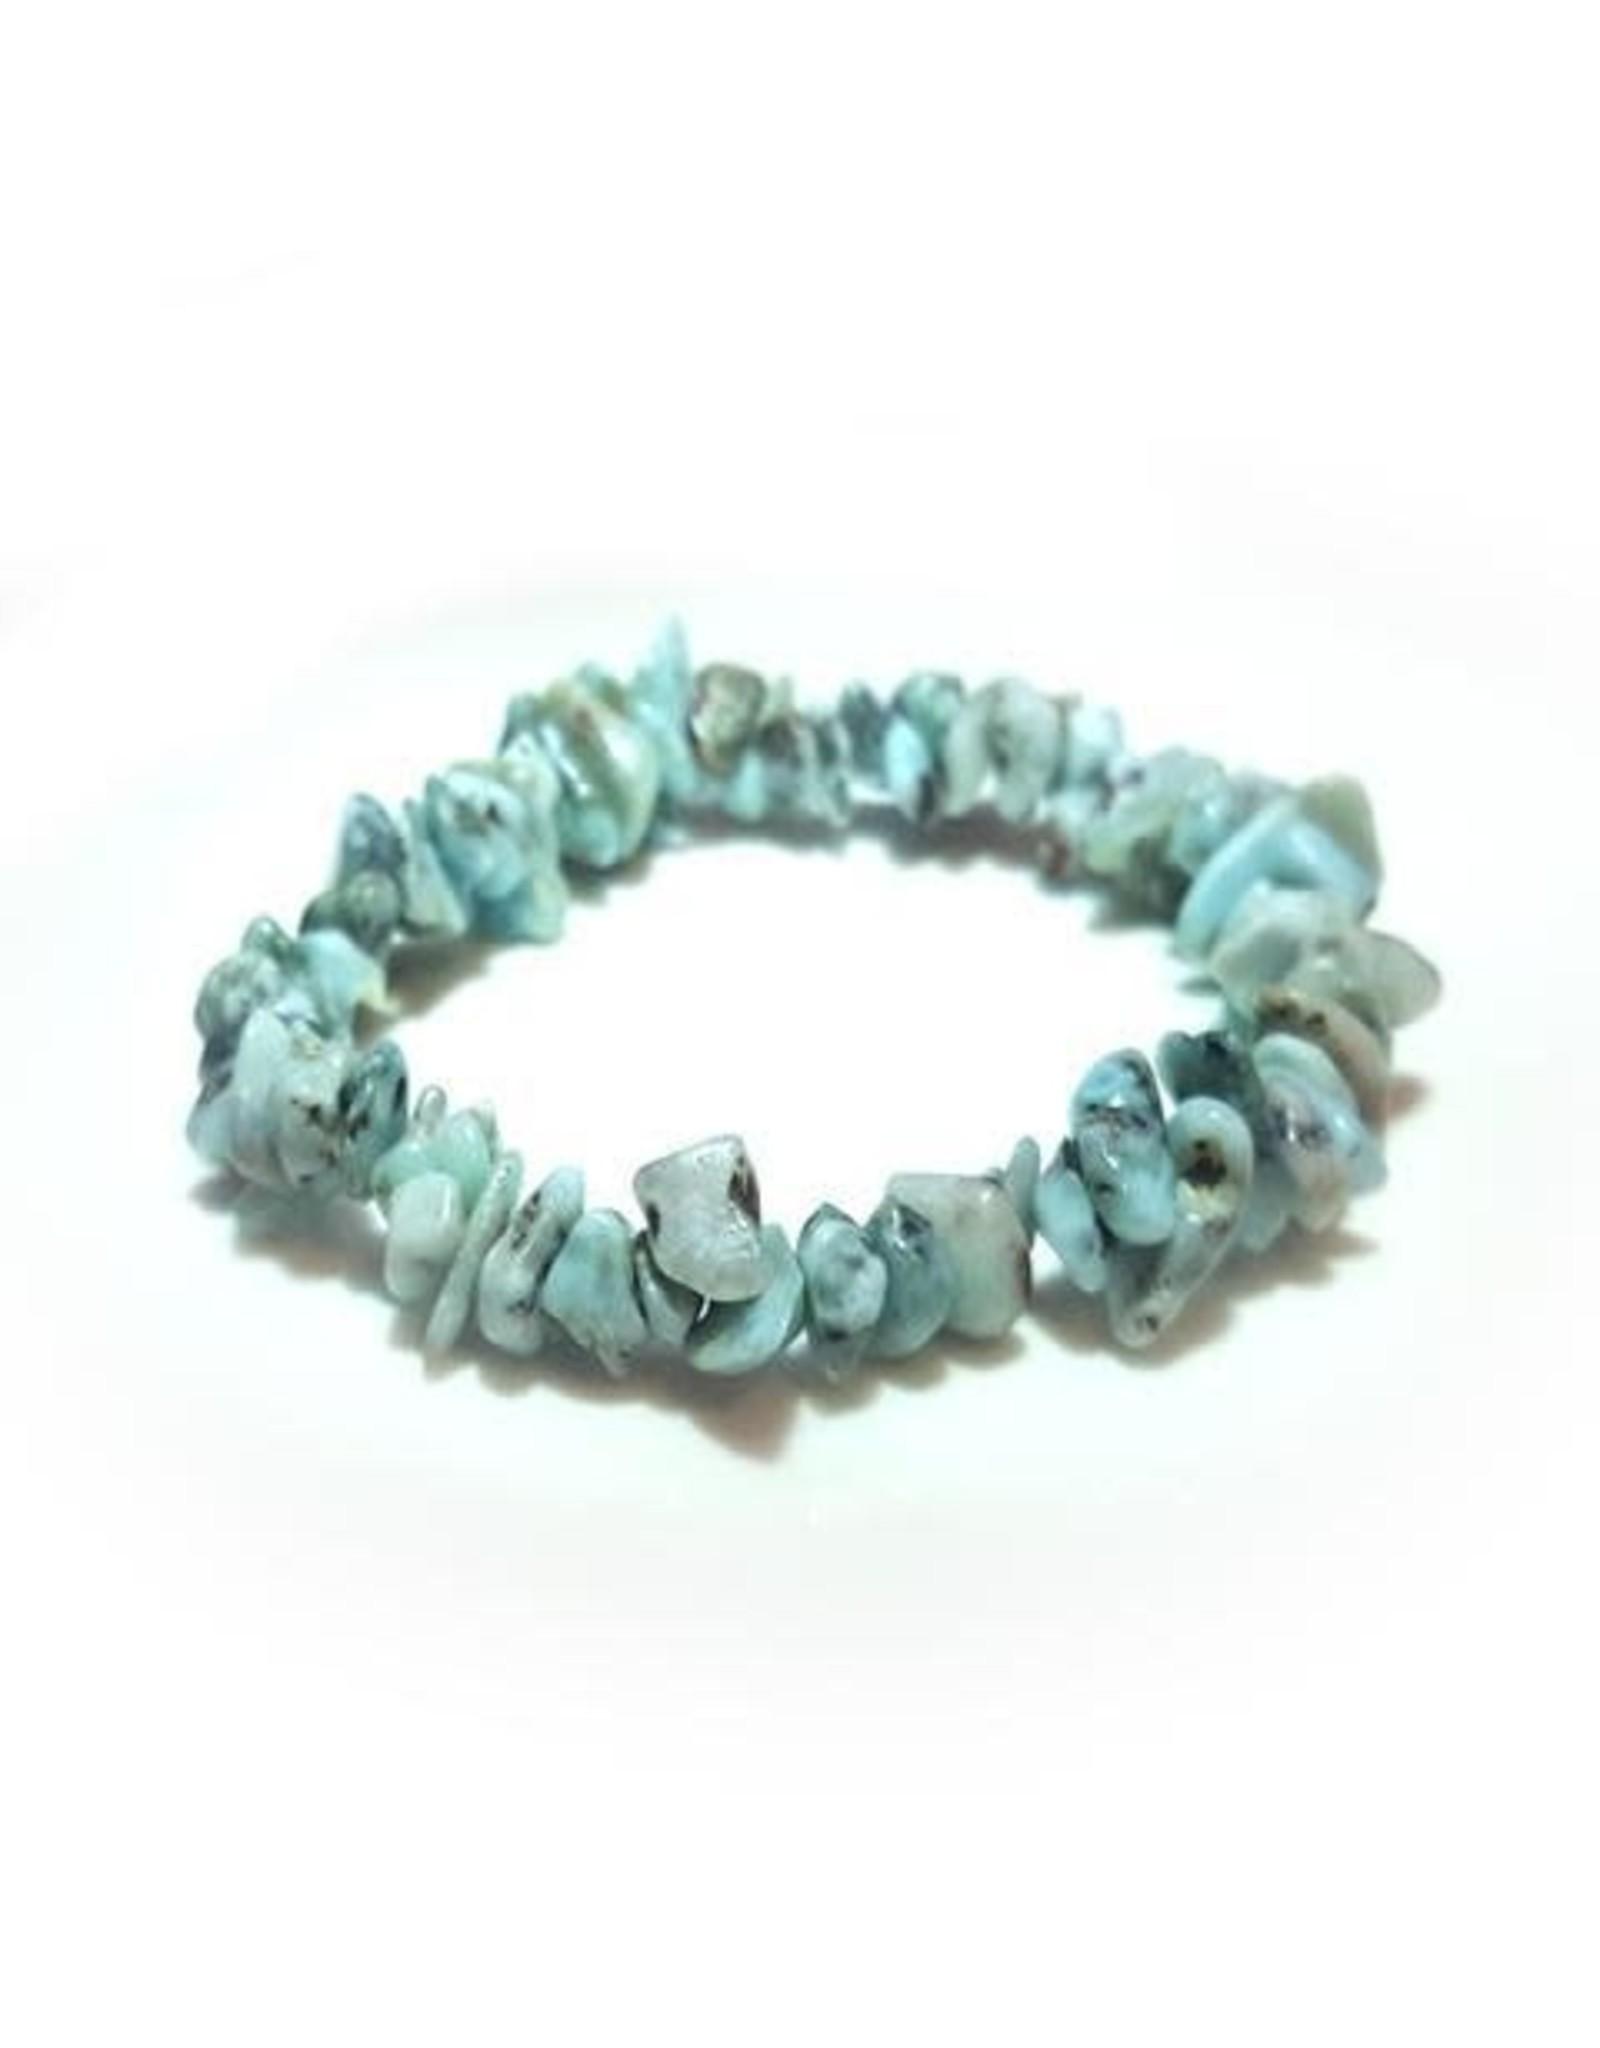 Silverstone Crystal Chip Bracelet - Larimar